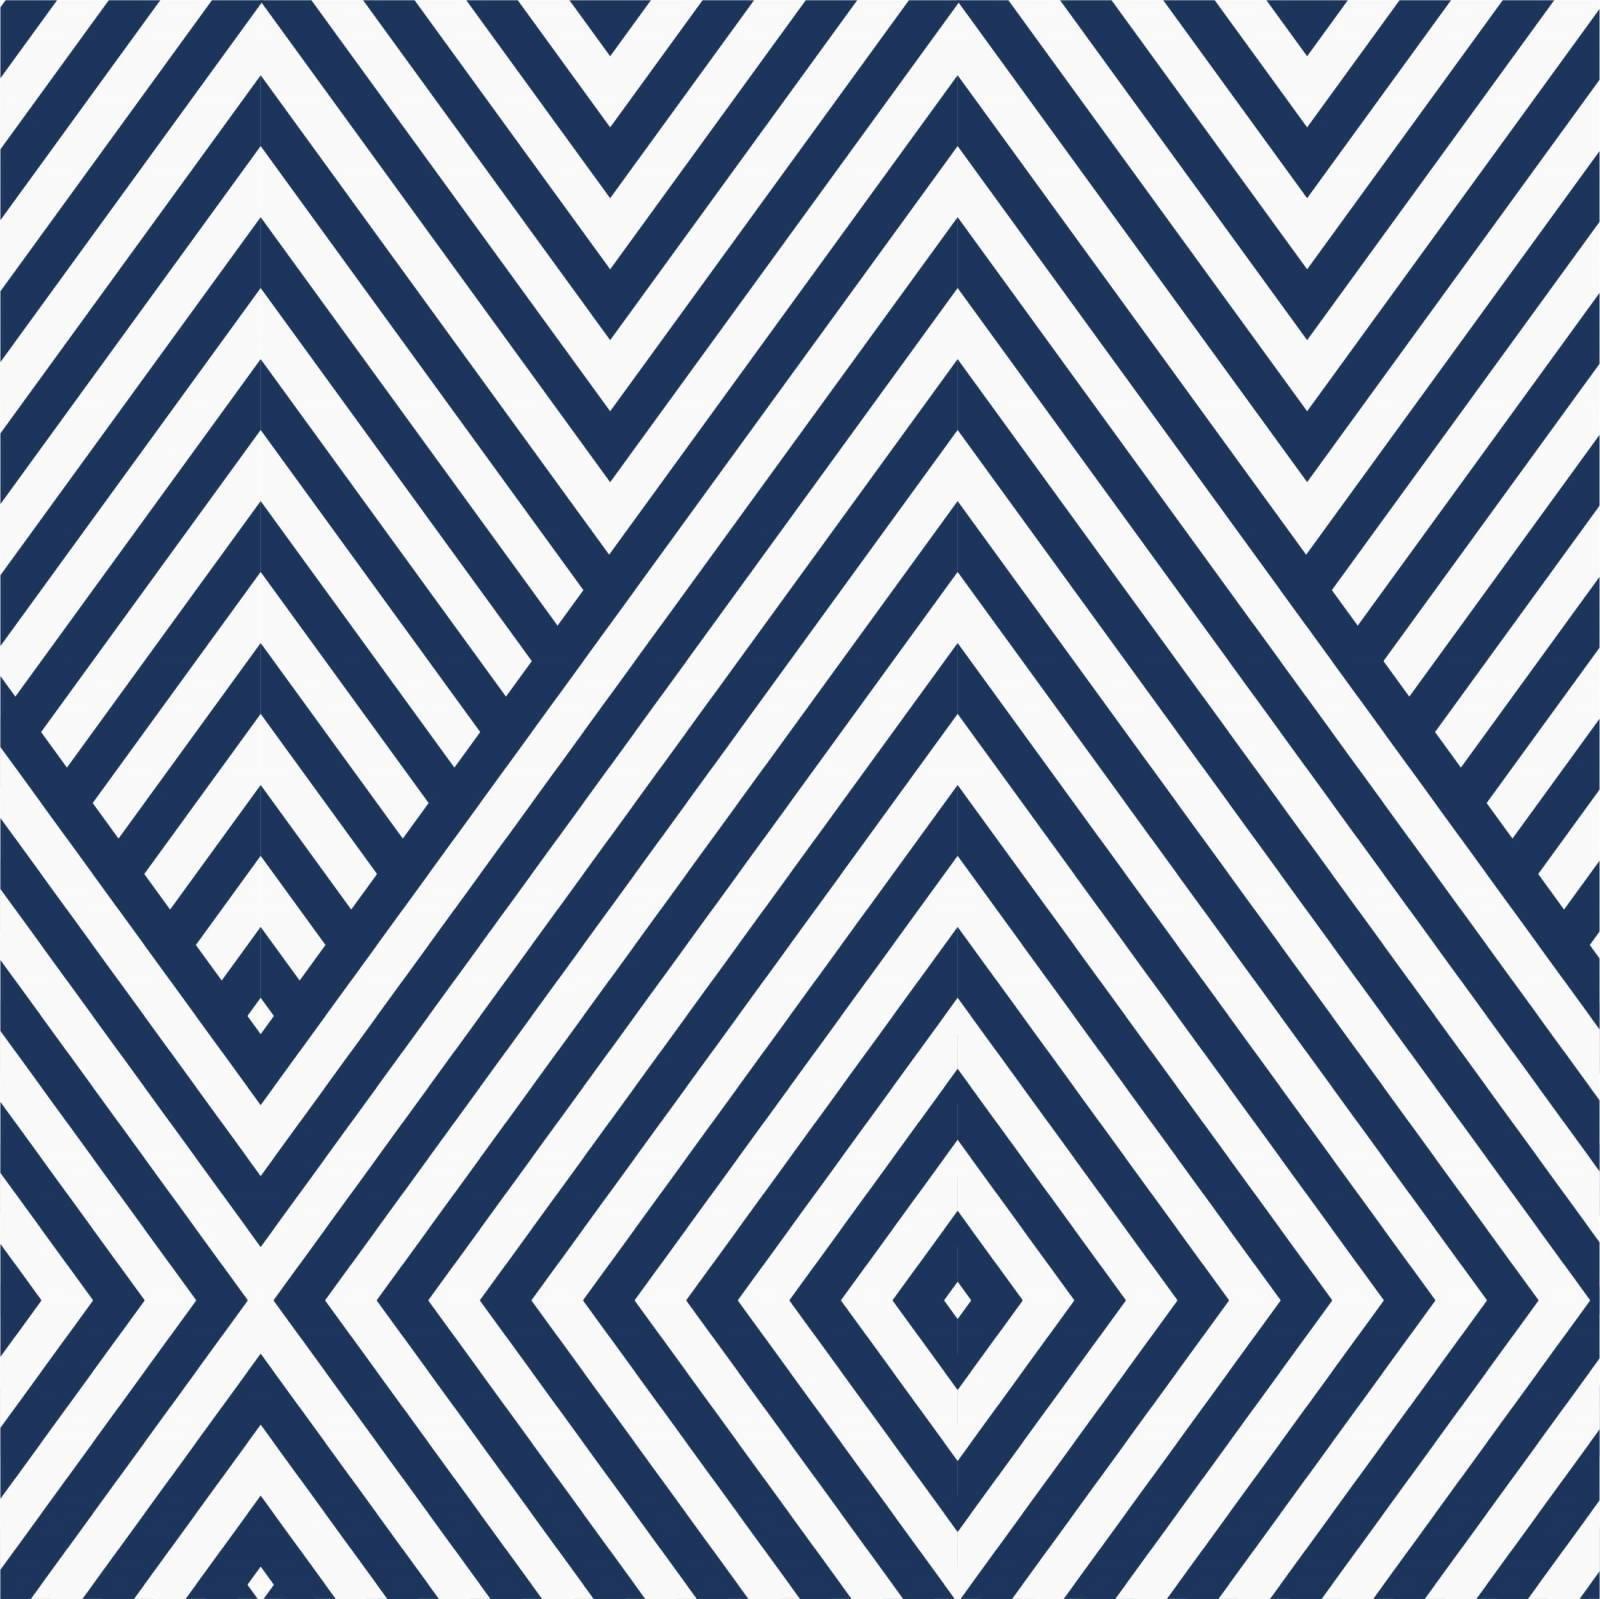 Papel de Parede Adesivo Geometrico Azul e Branco /Rolo - Redecorei